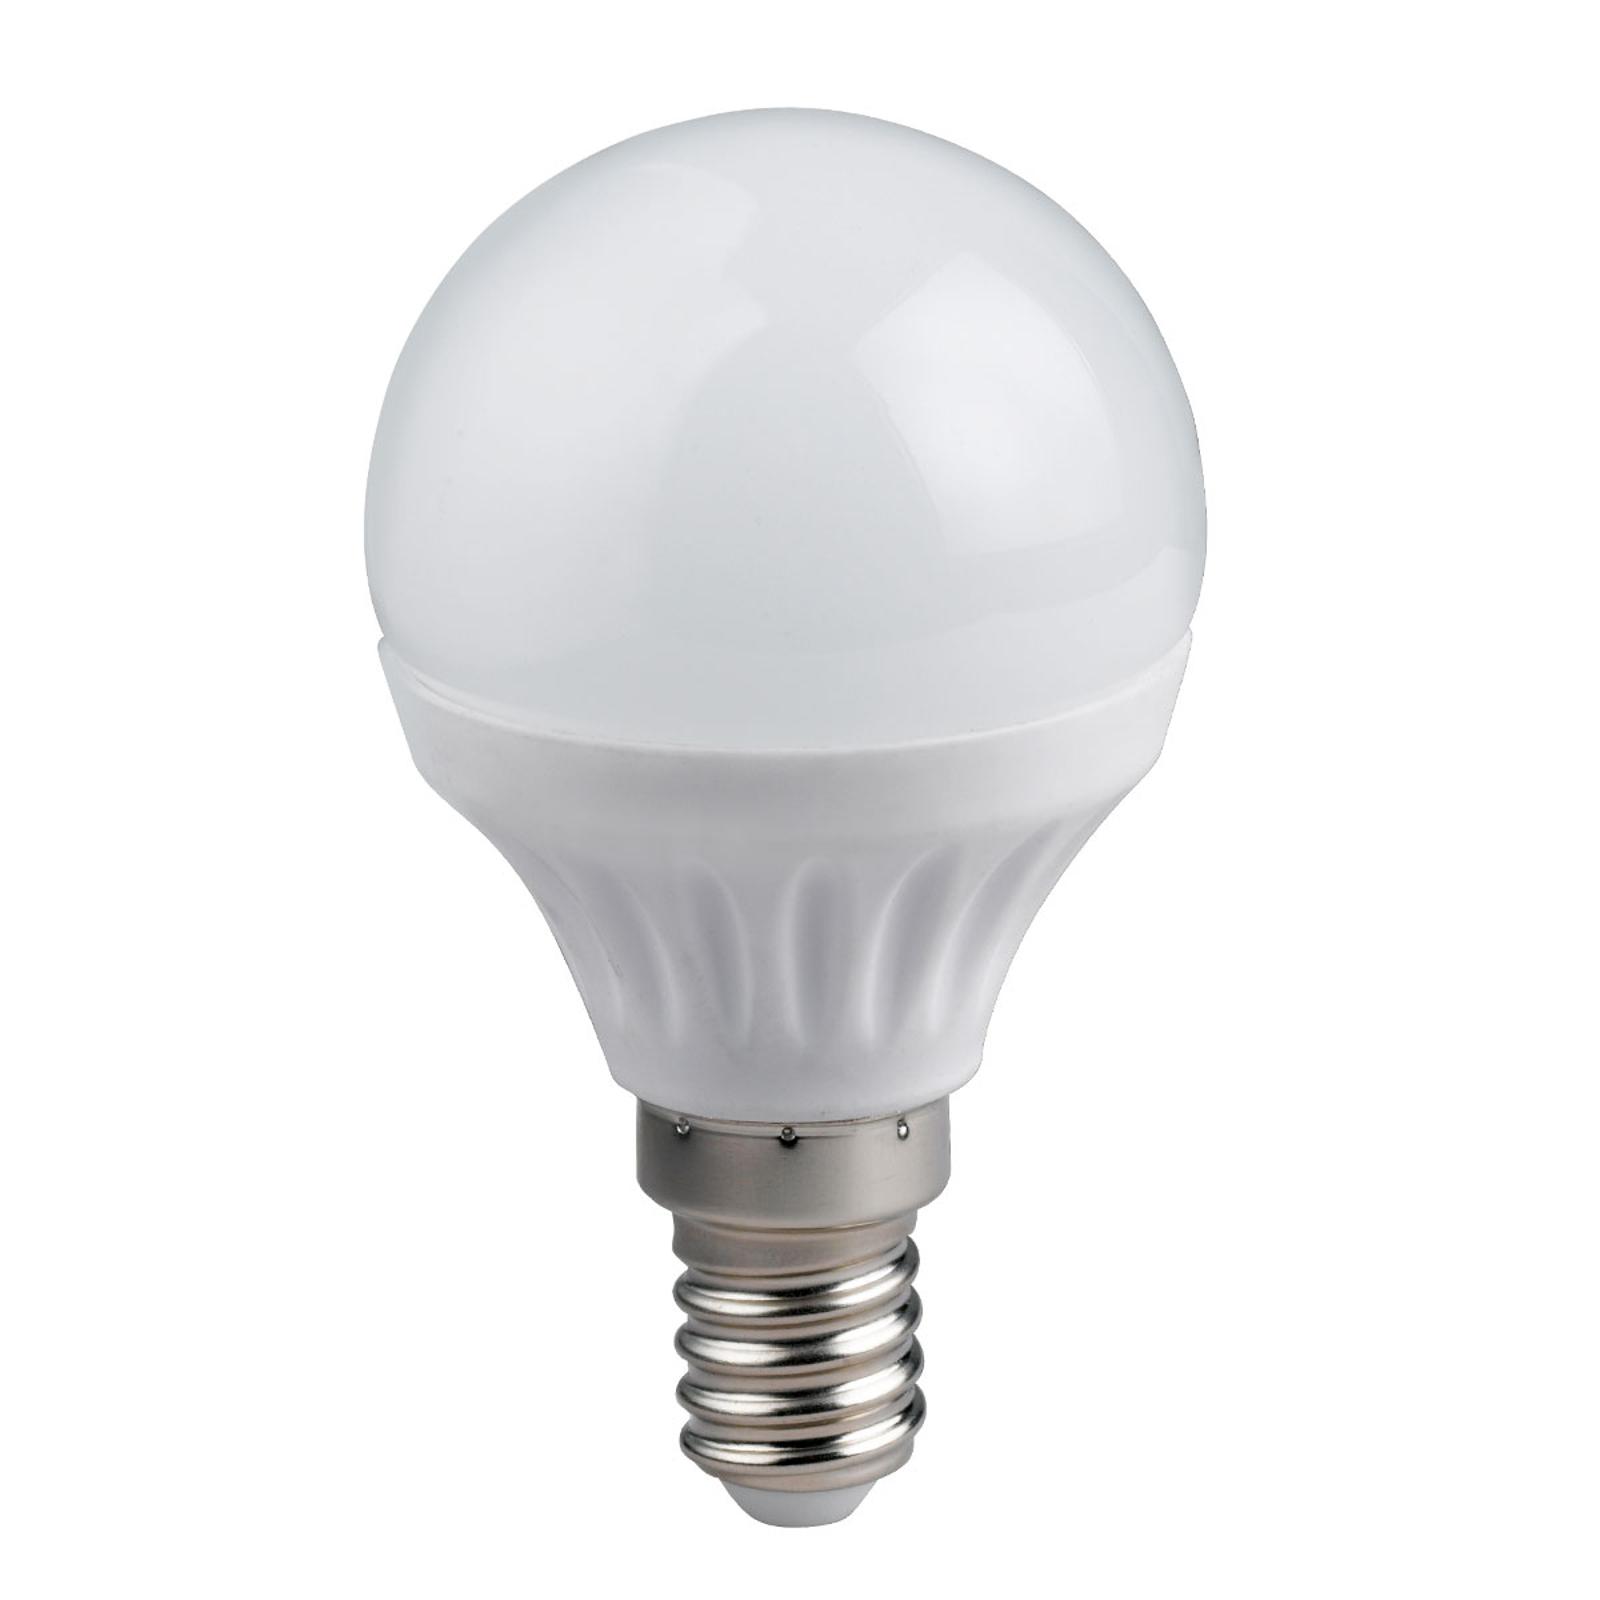 LED-Tropfenlampe E14 5W 3.000 K dimmbar